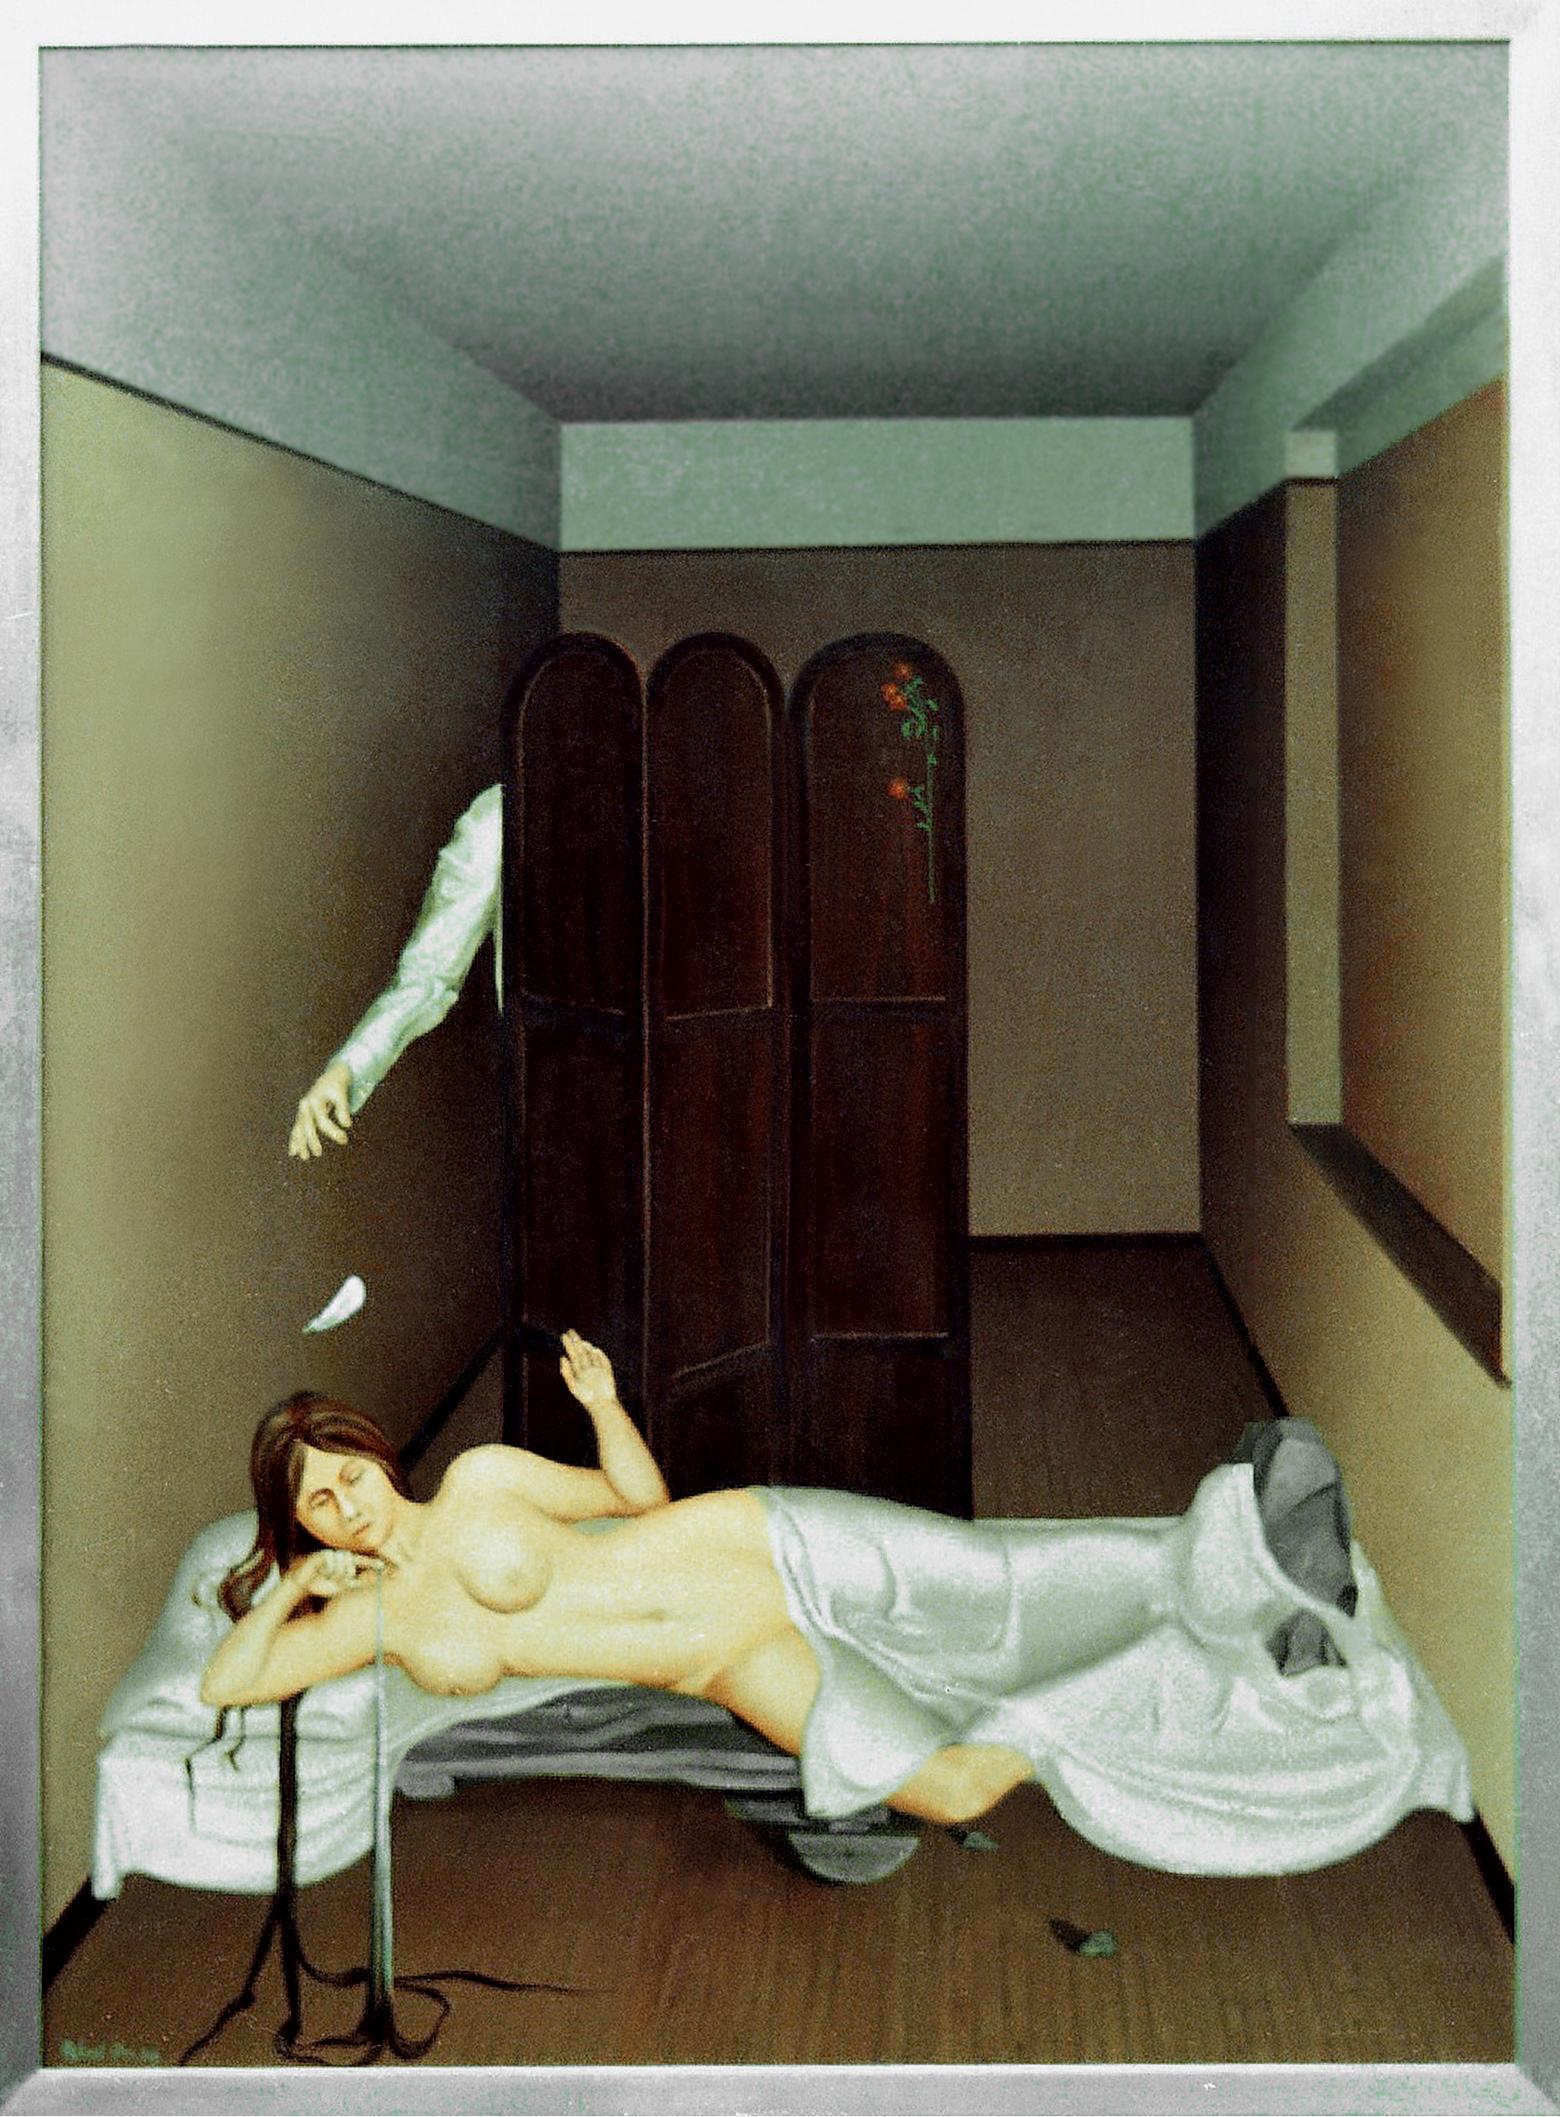 Room V - The Lover. 38 x 17.5 inch